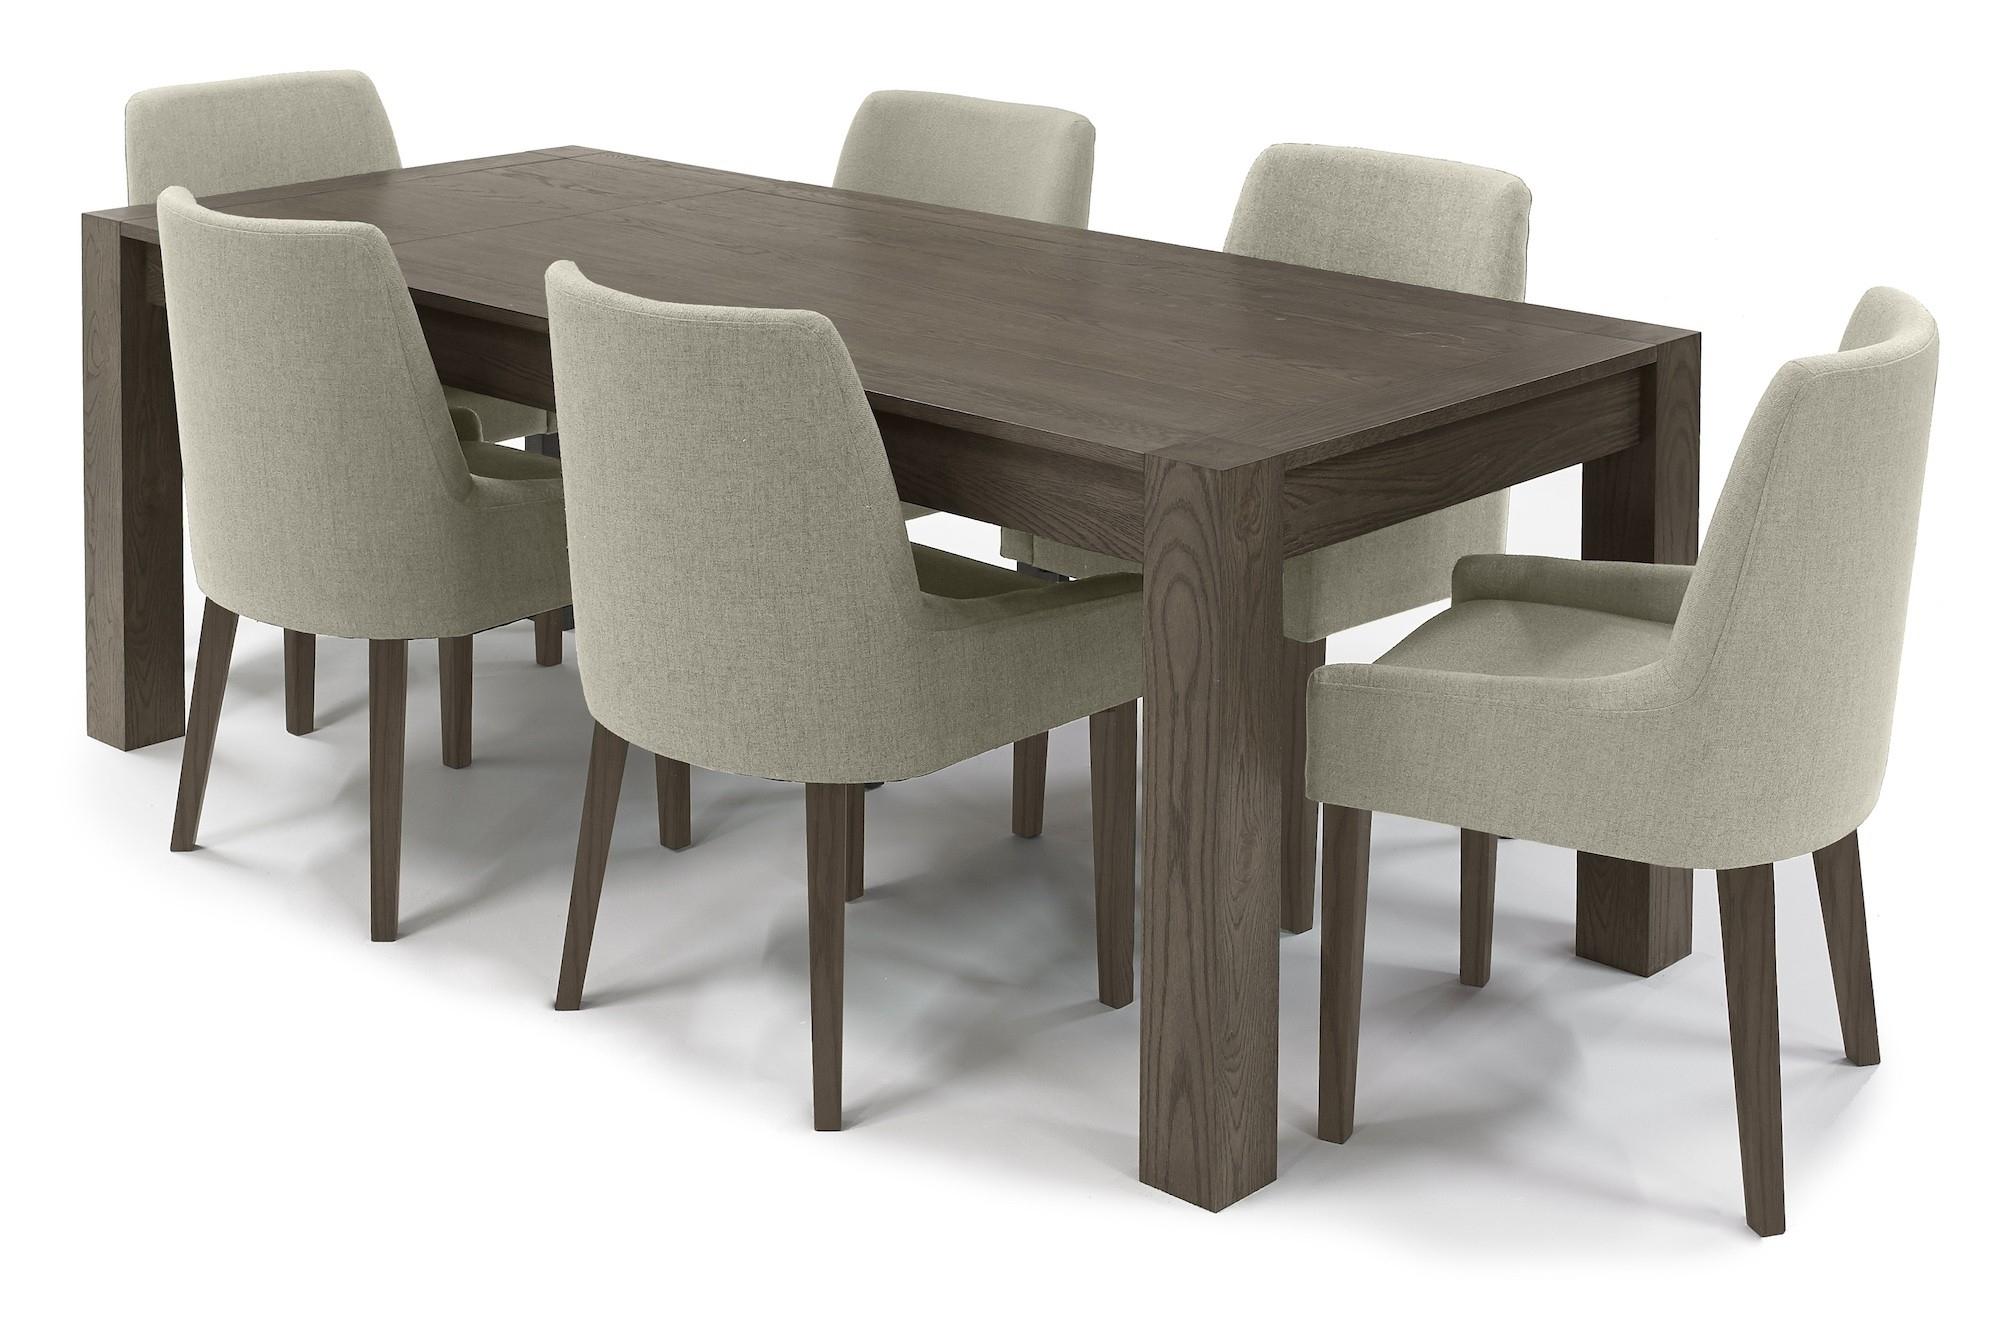 Favorite Turin Dark Oak Dining Table Medium 4 6 Seater End Extension Dining Regarding Dark Dining Tables (View 4 of 25)